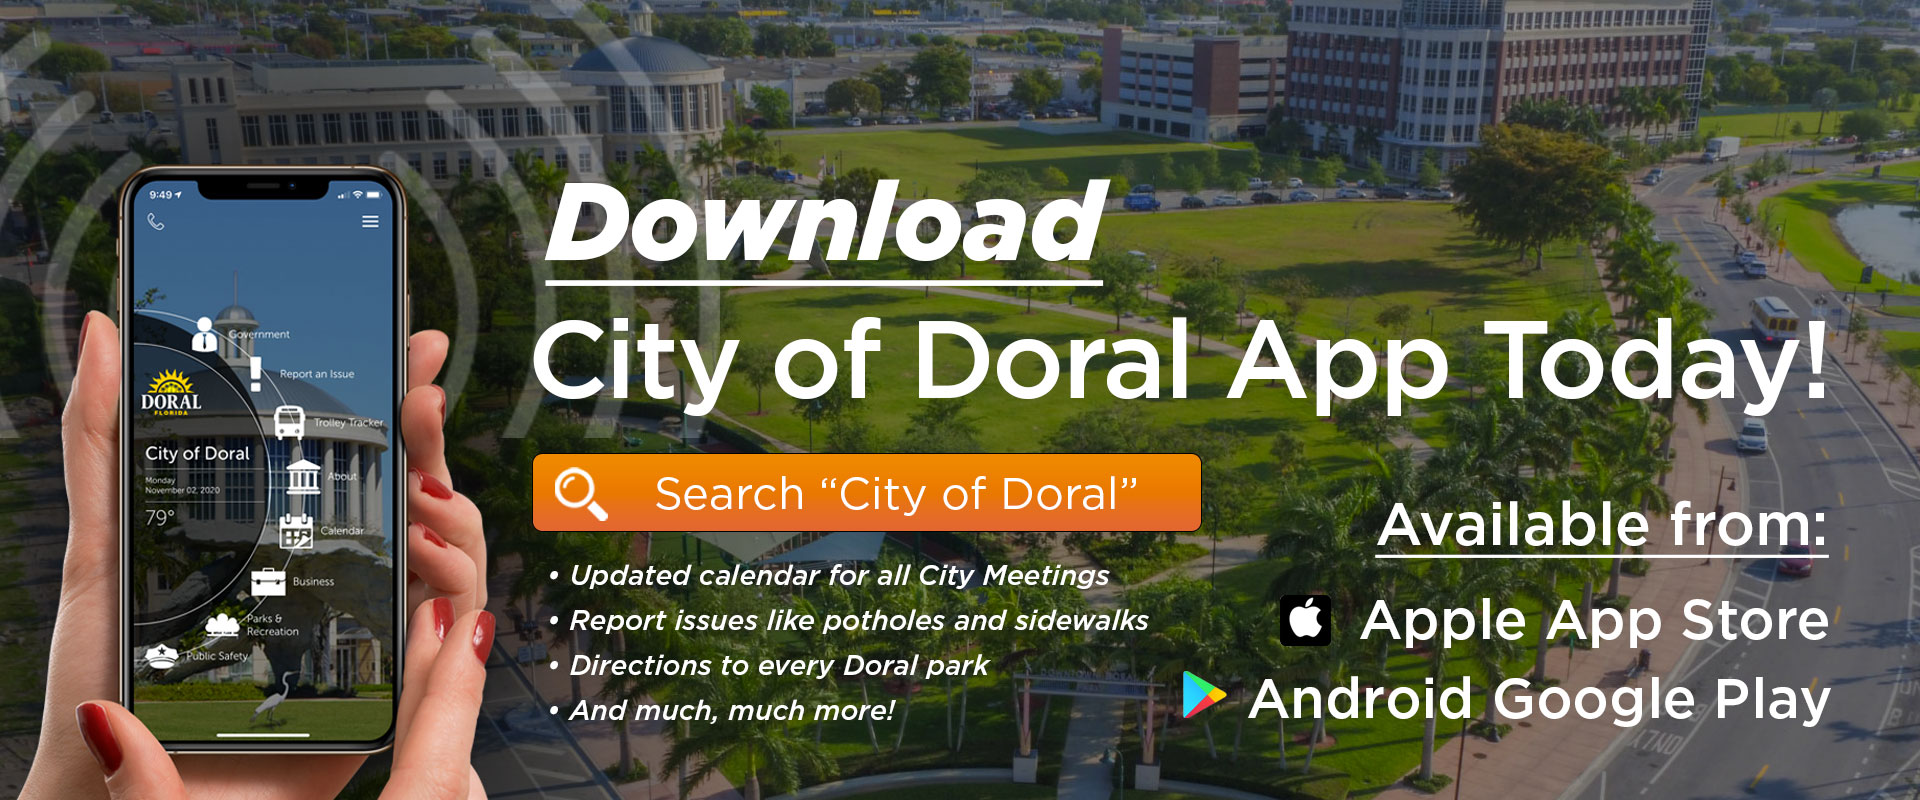 City of Doral App